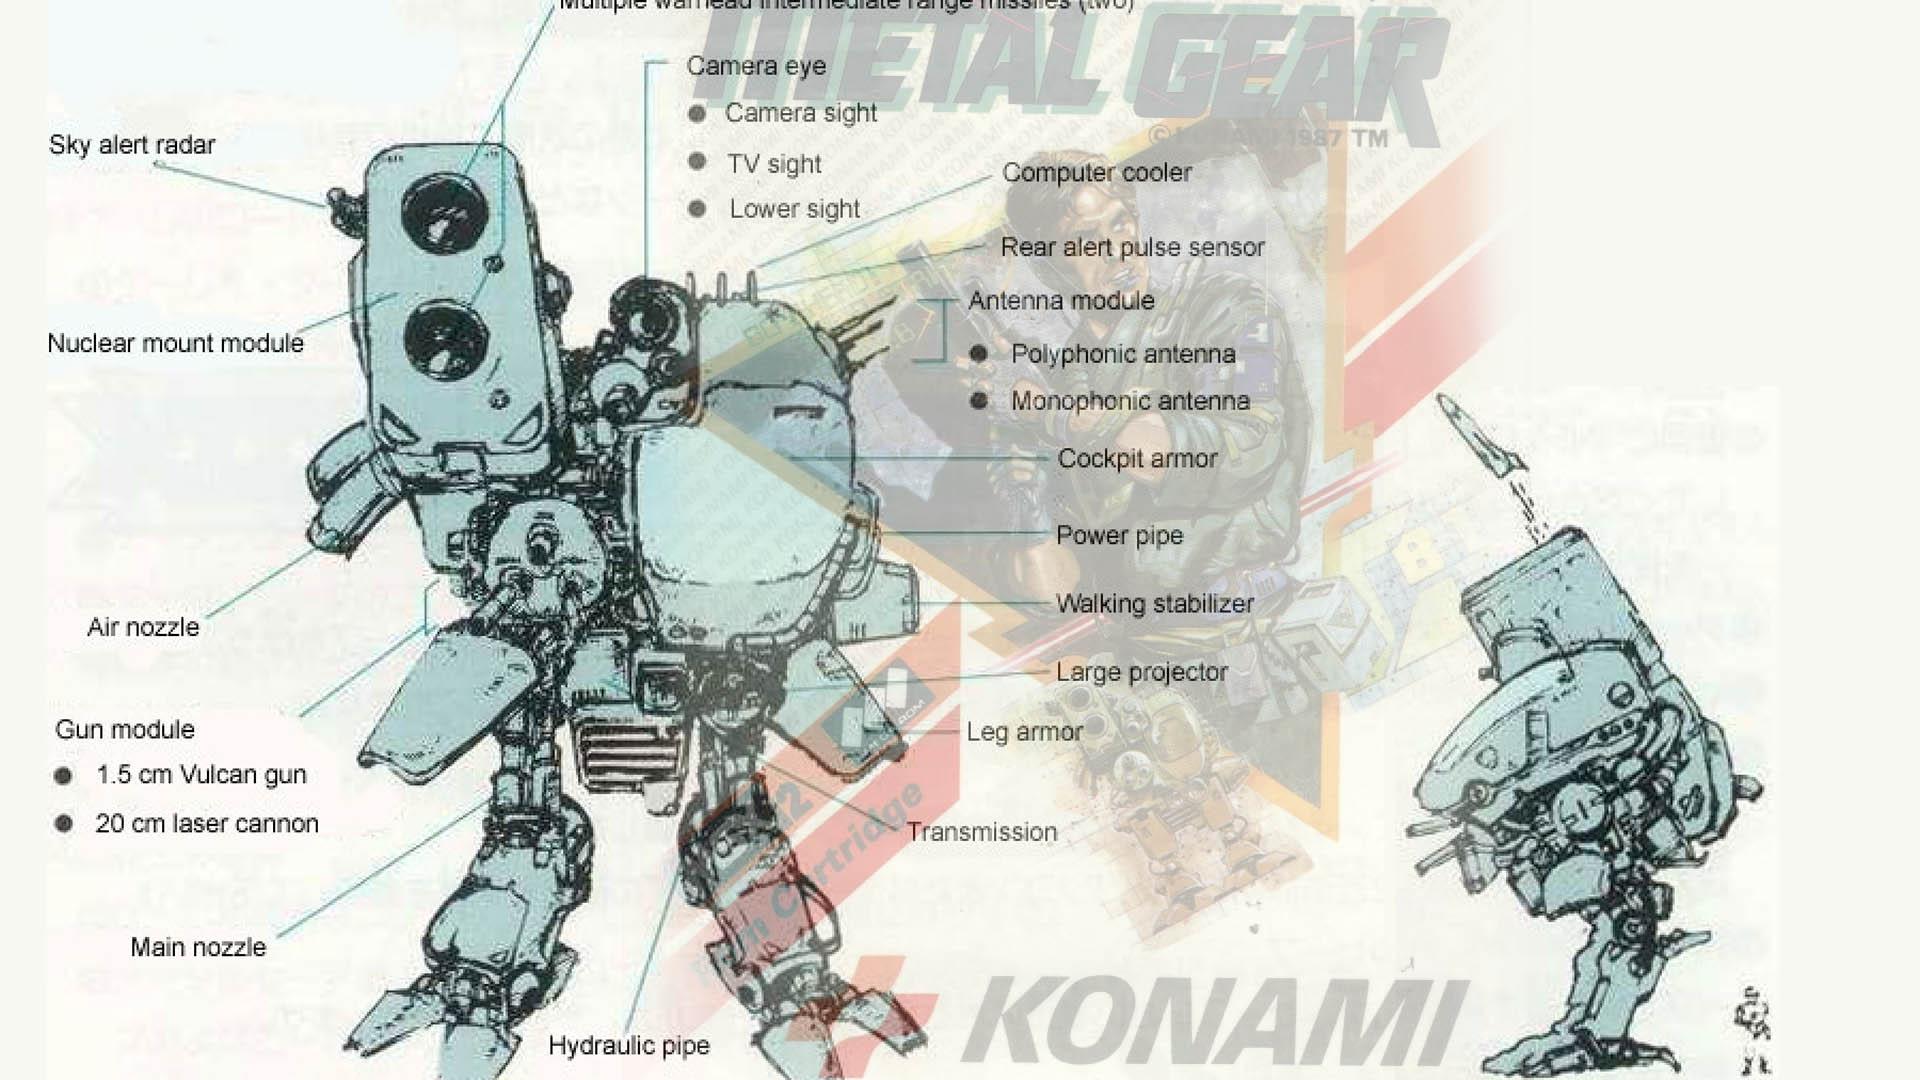 The anatomy of Metal Gear, part 1: On-site procurement | Retronauts